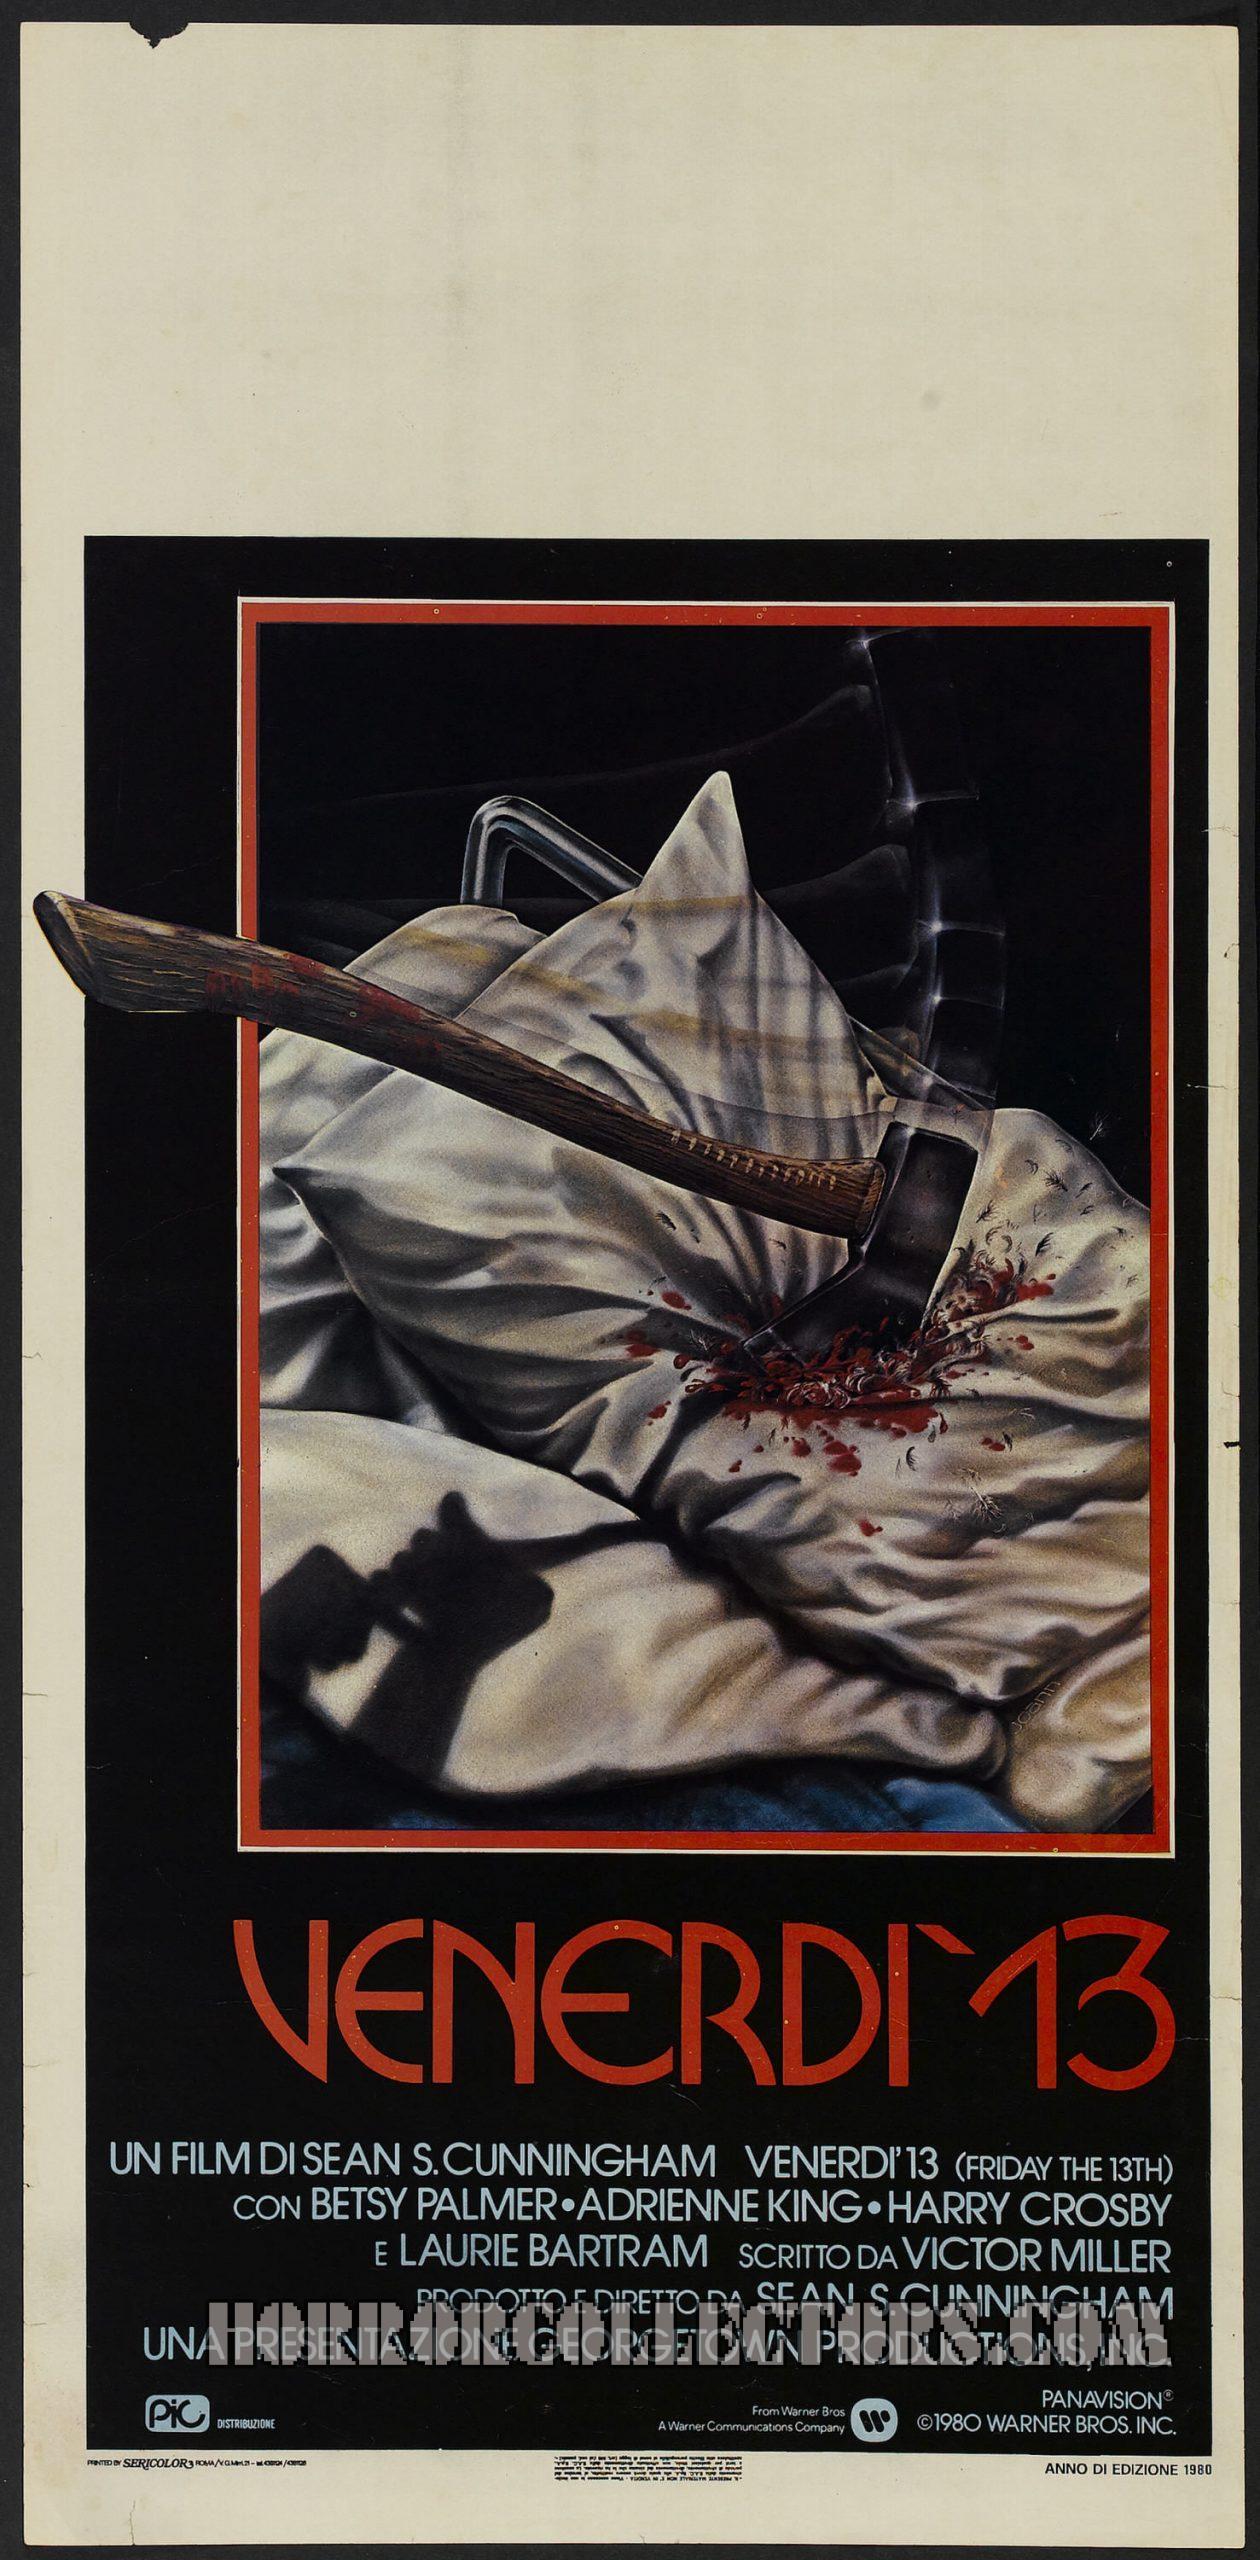 Friday the 13th Italian Locandina Poster Venerdi 13